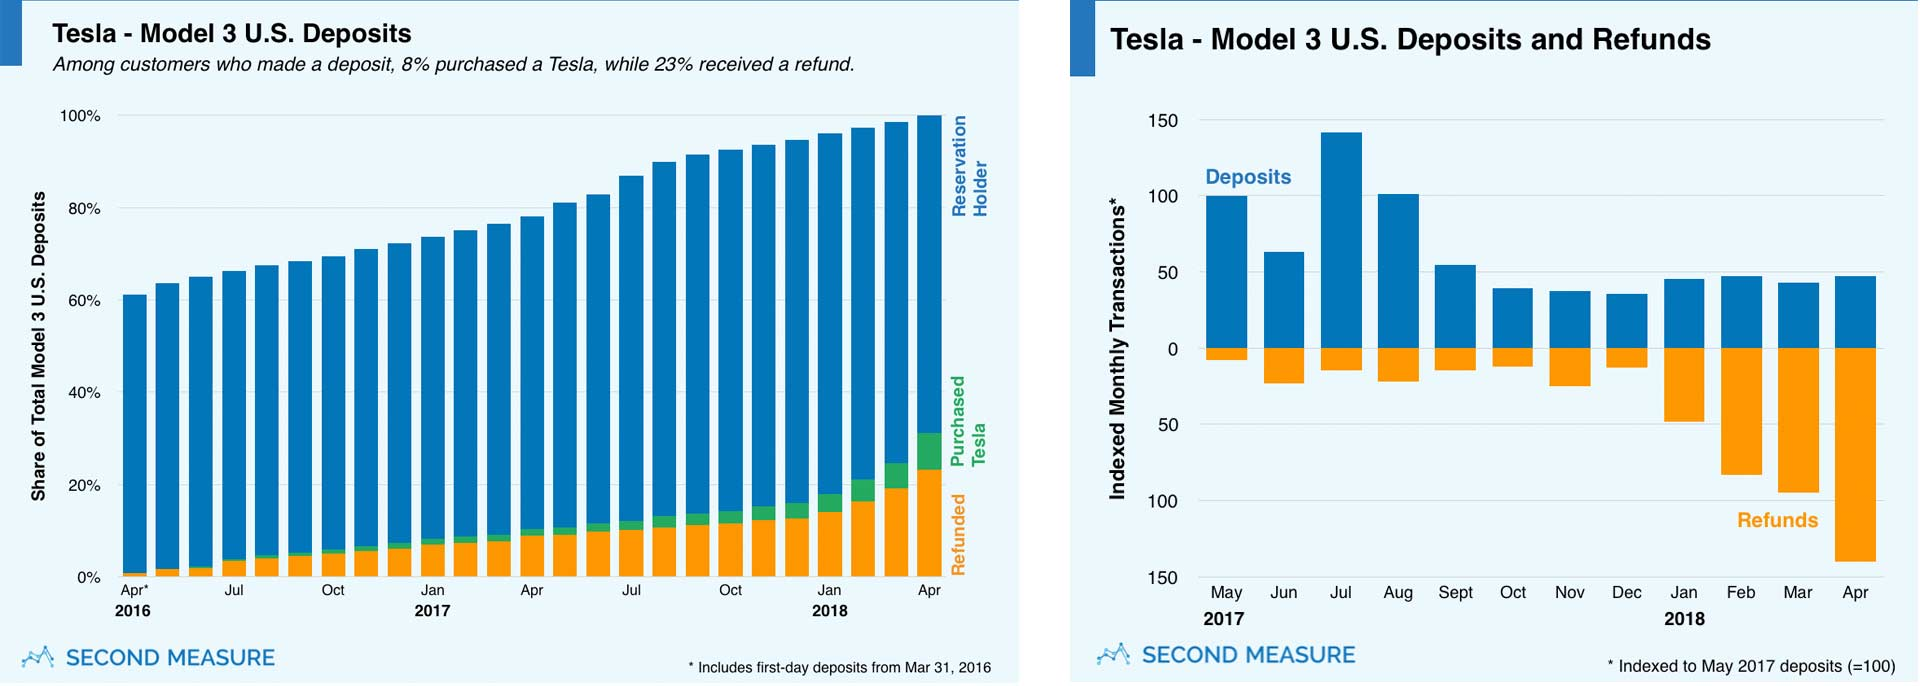 Second-Measure-Tesla-Model-3-deposits-and-refunds